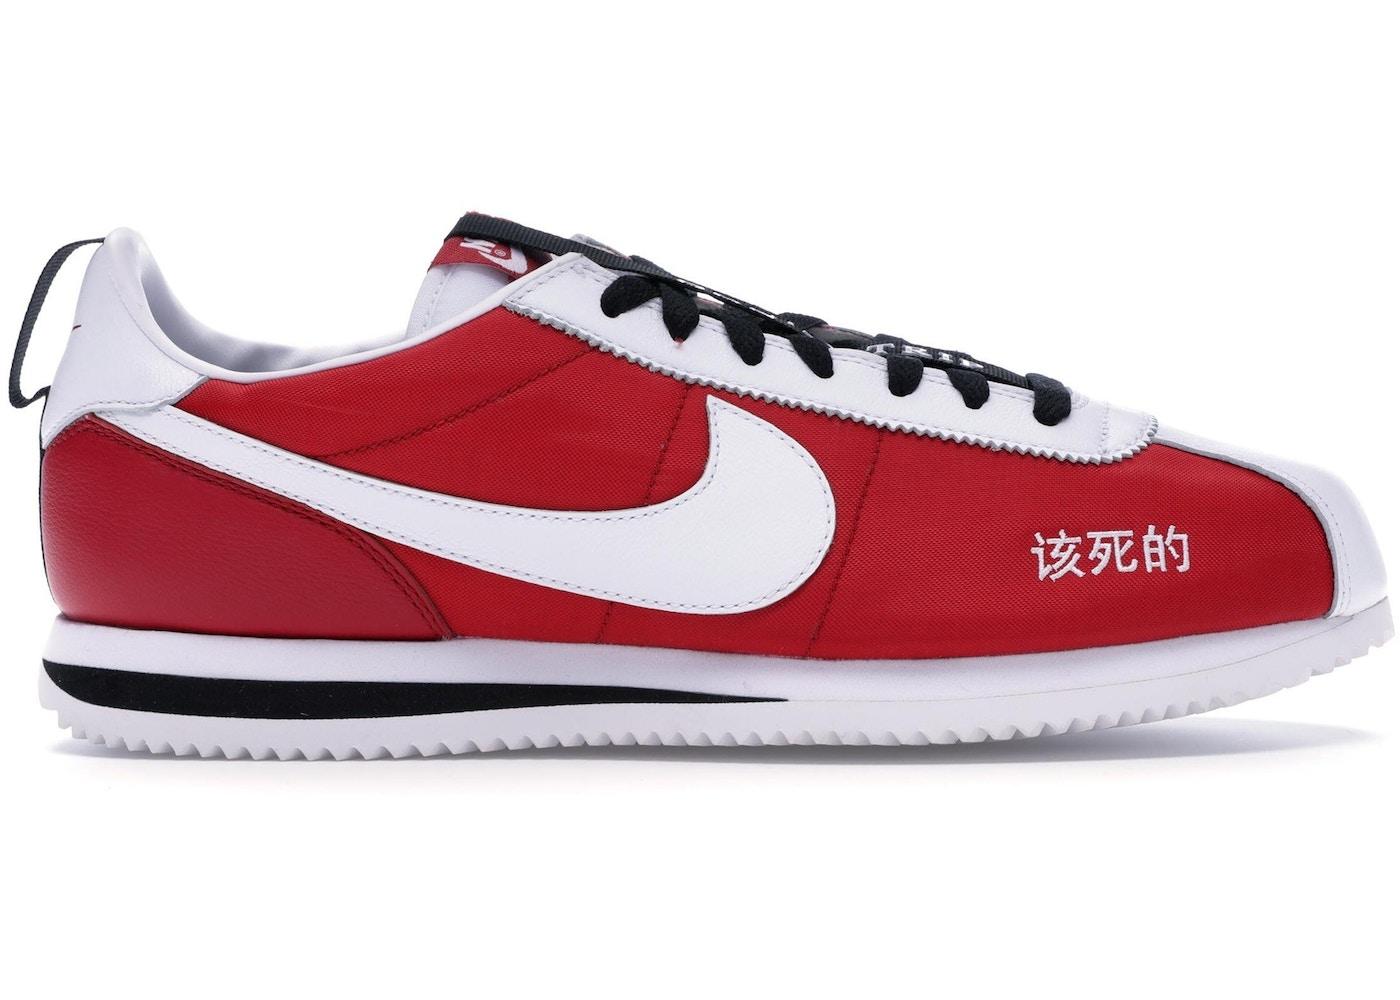 on sale 1c197 36b93 Nike Cortez Kenny 2 Kendrick Lamar Kung Fu Kenny